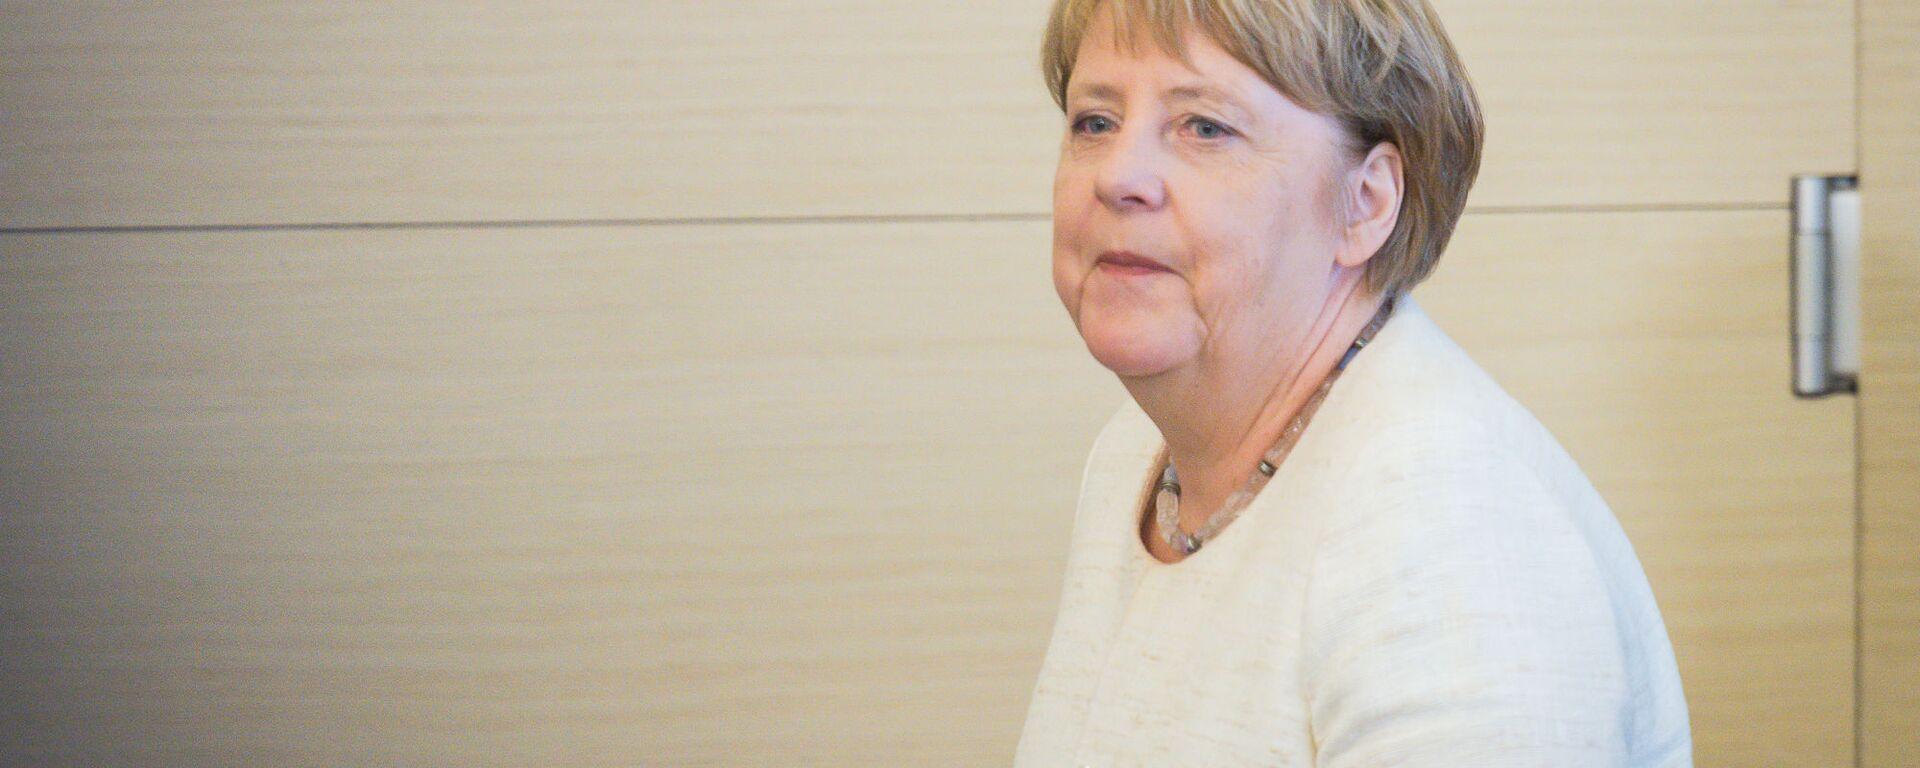 Канцлер Германии Ангела Меркель  - Sputnik Грузия, 1920, 18.12.2019